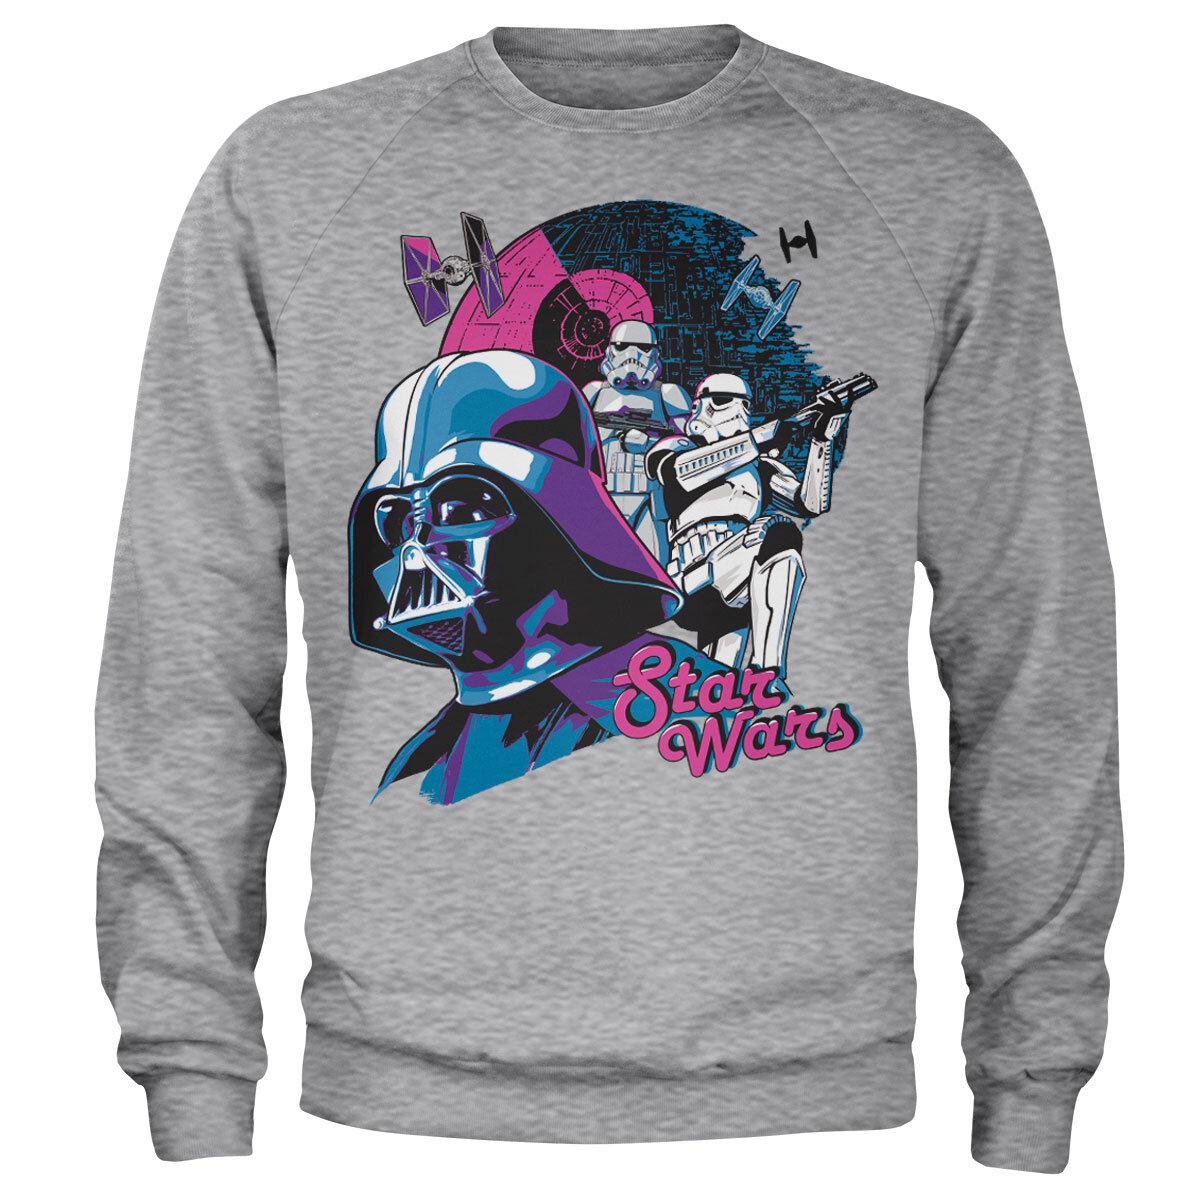 Star Wars - Colorful Death Sweatshirt